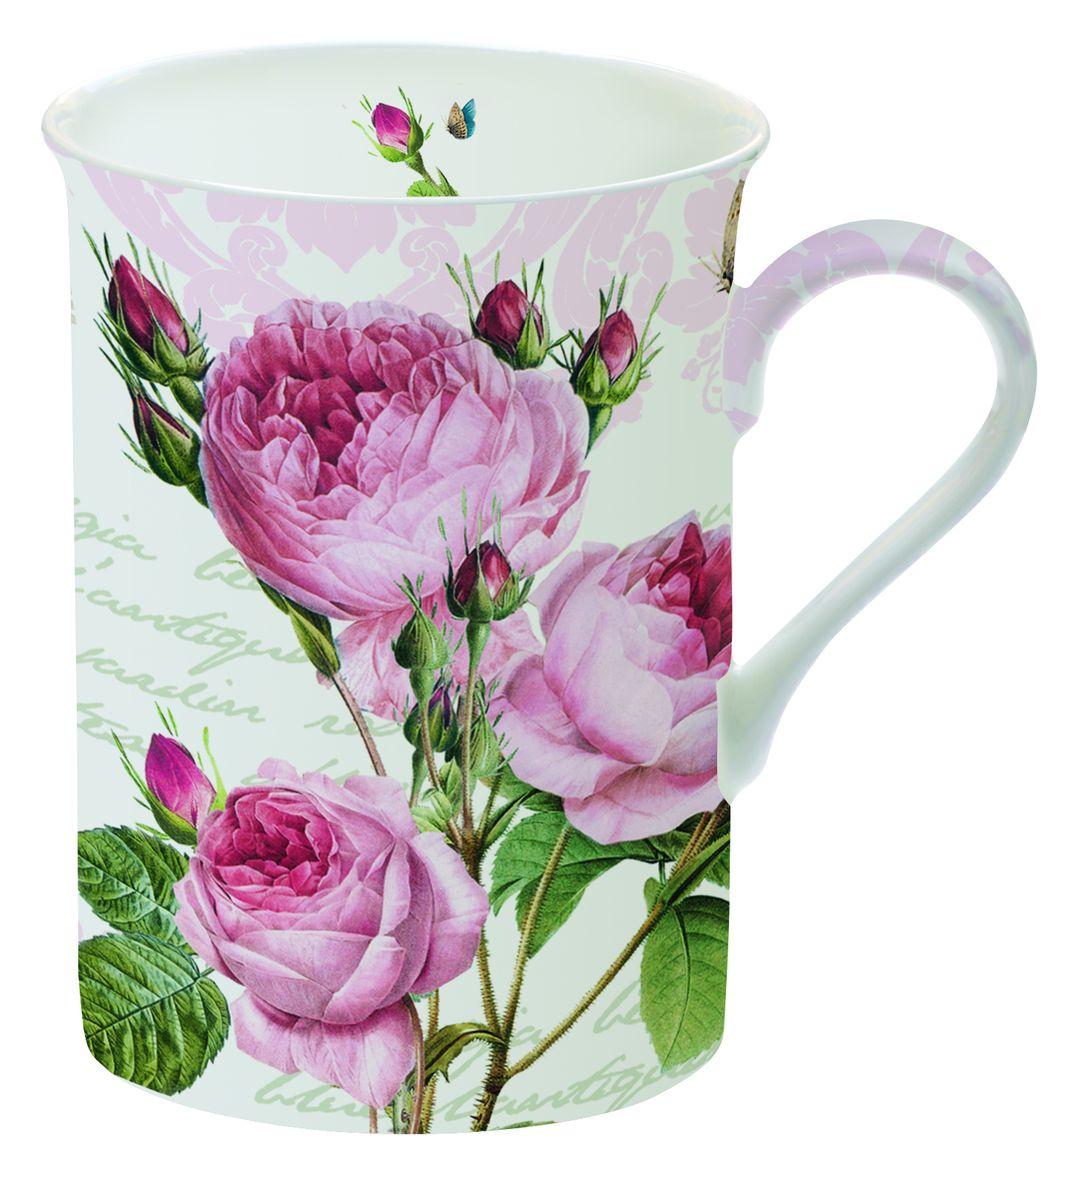 Кружка Nuova R2S Романтические розы, 250 мл кружка nuova r2s маффины 320 мл